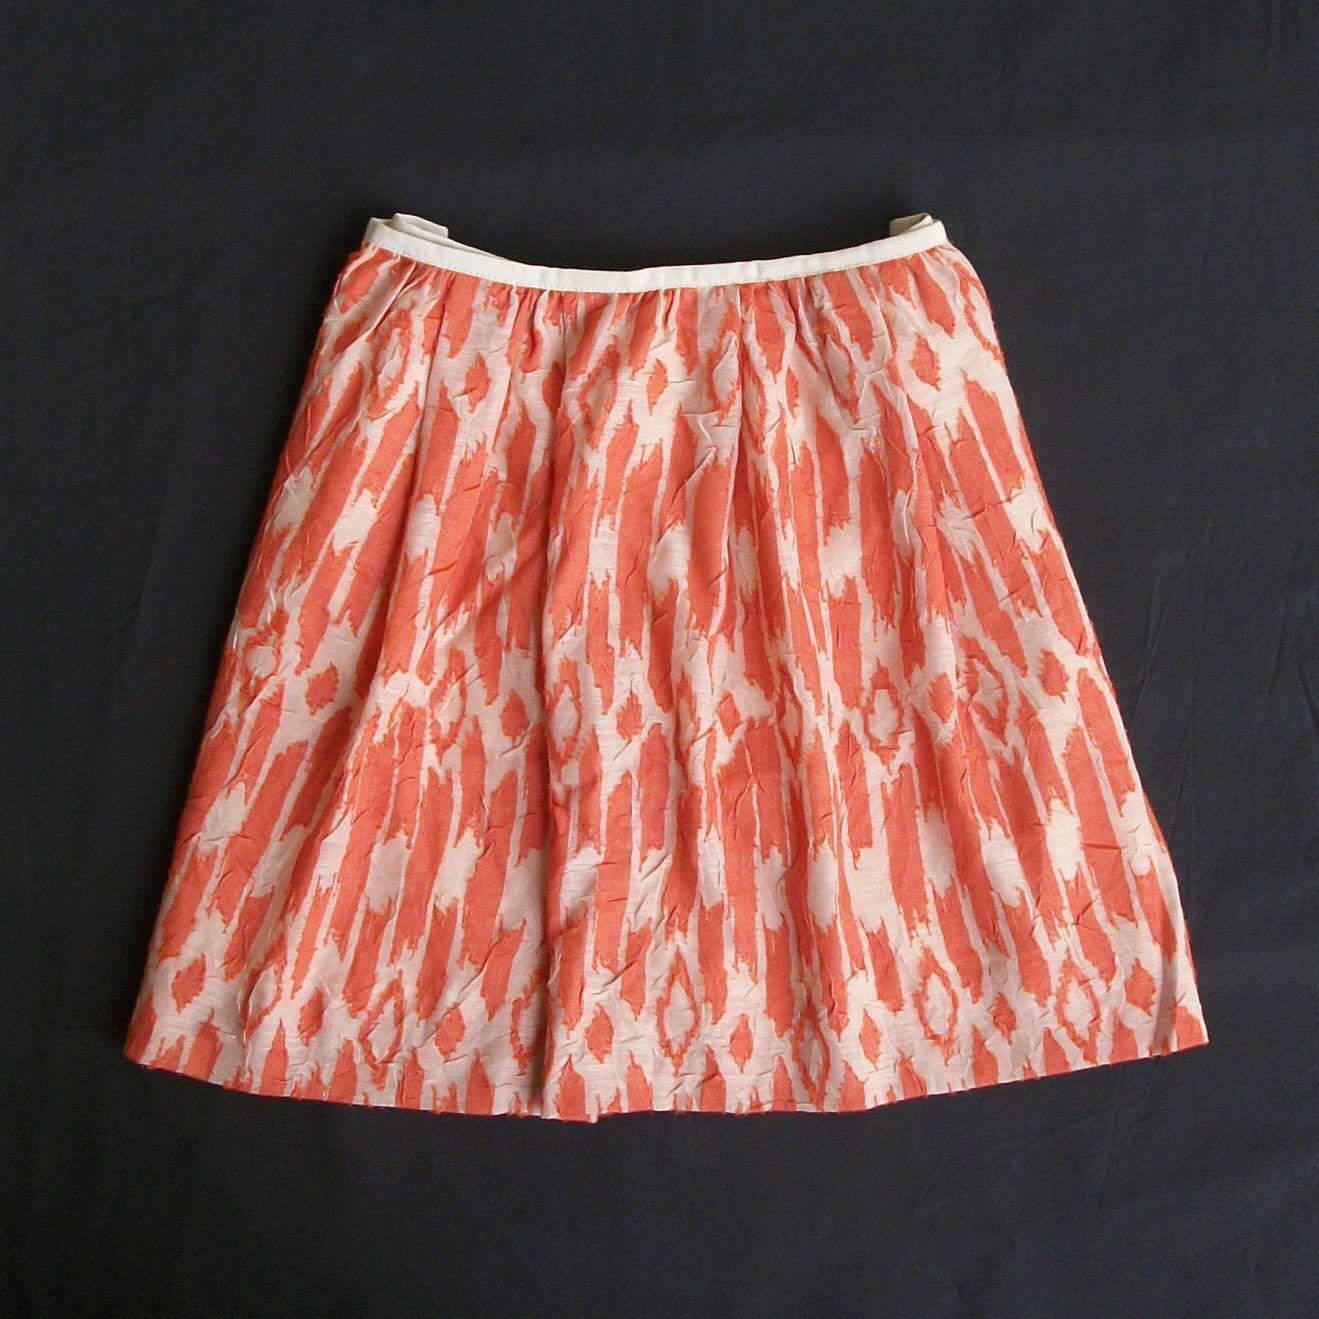 NWOT J.Crew 'Ikat Swing Skirt' 10 (Runs Small)